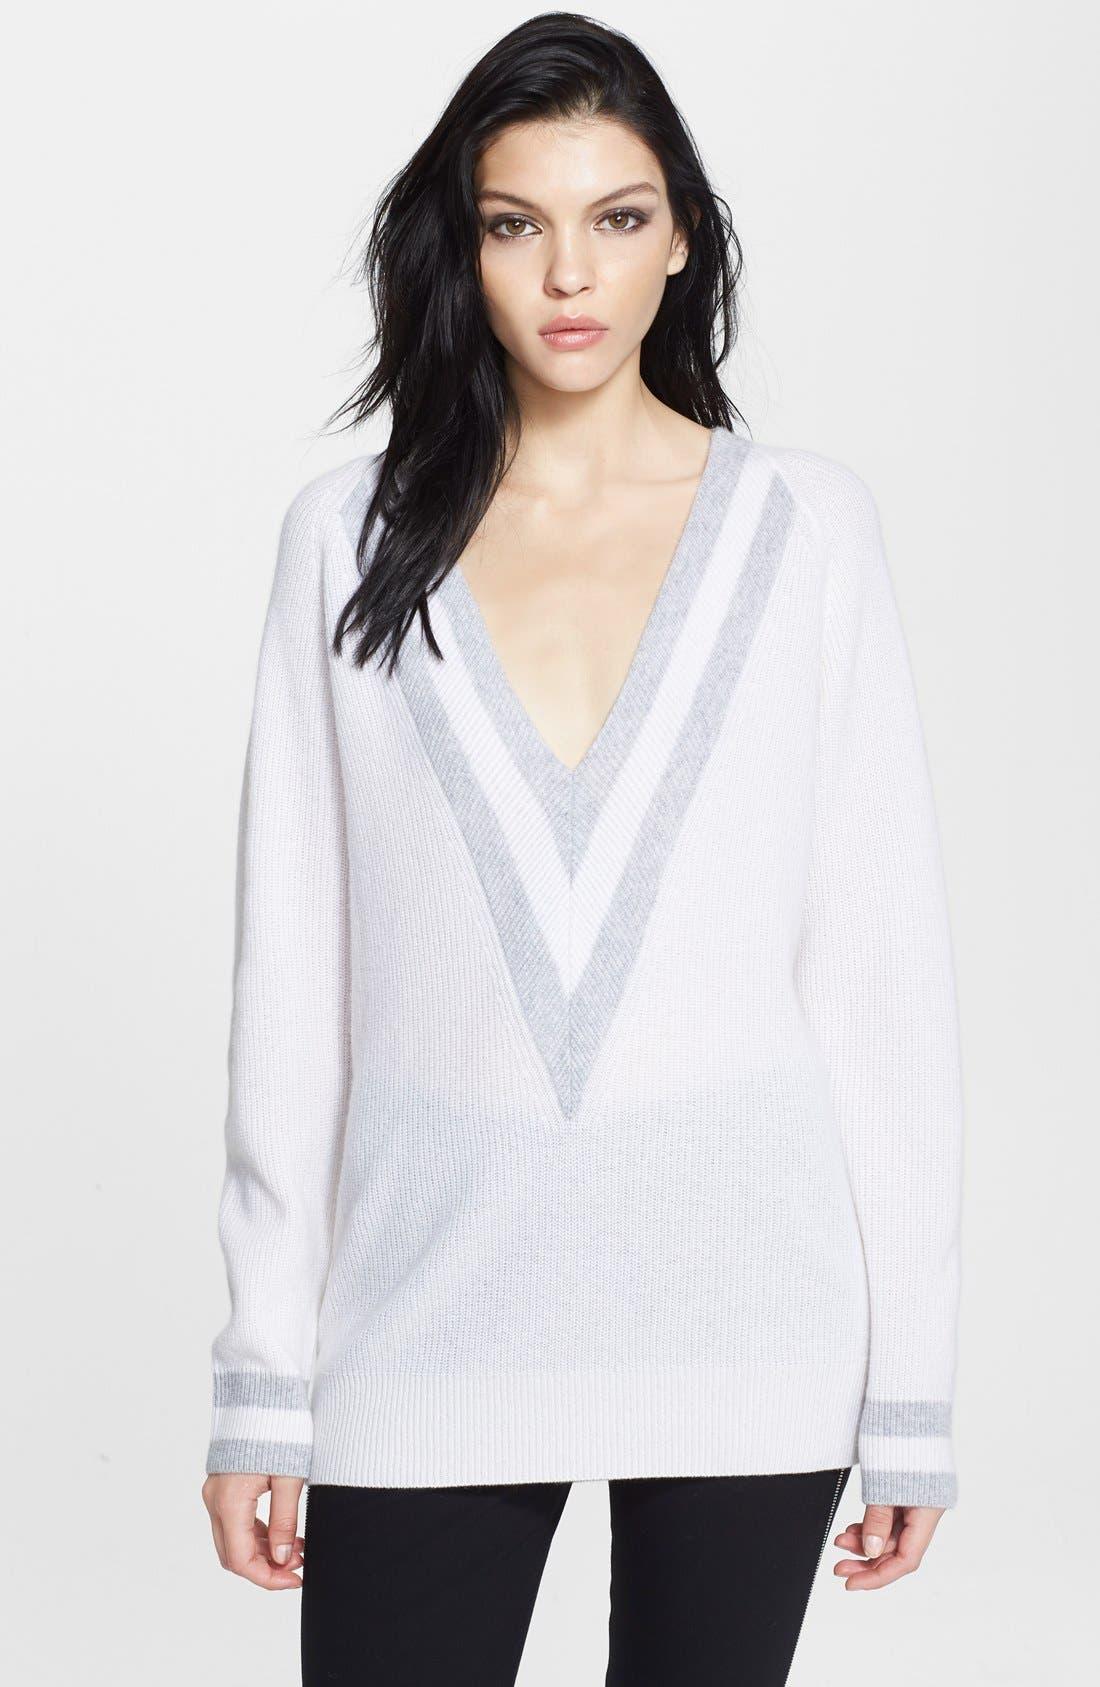 Alternate Image 1 Selected - rag & bone 'Talia' V-Neck Cashmere Sweater